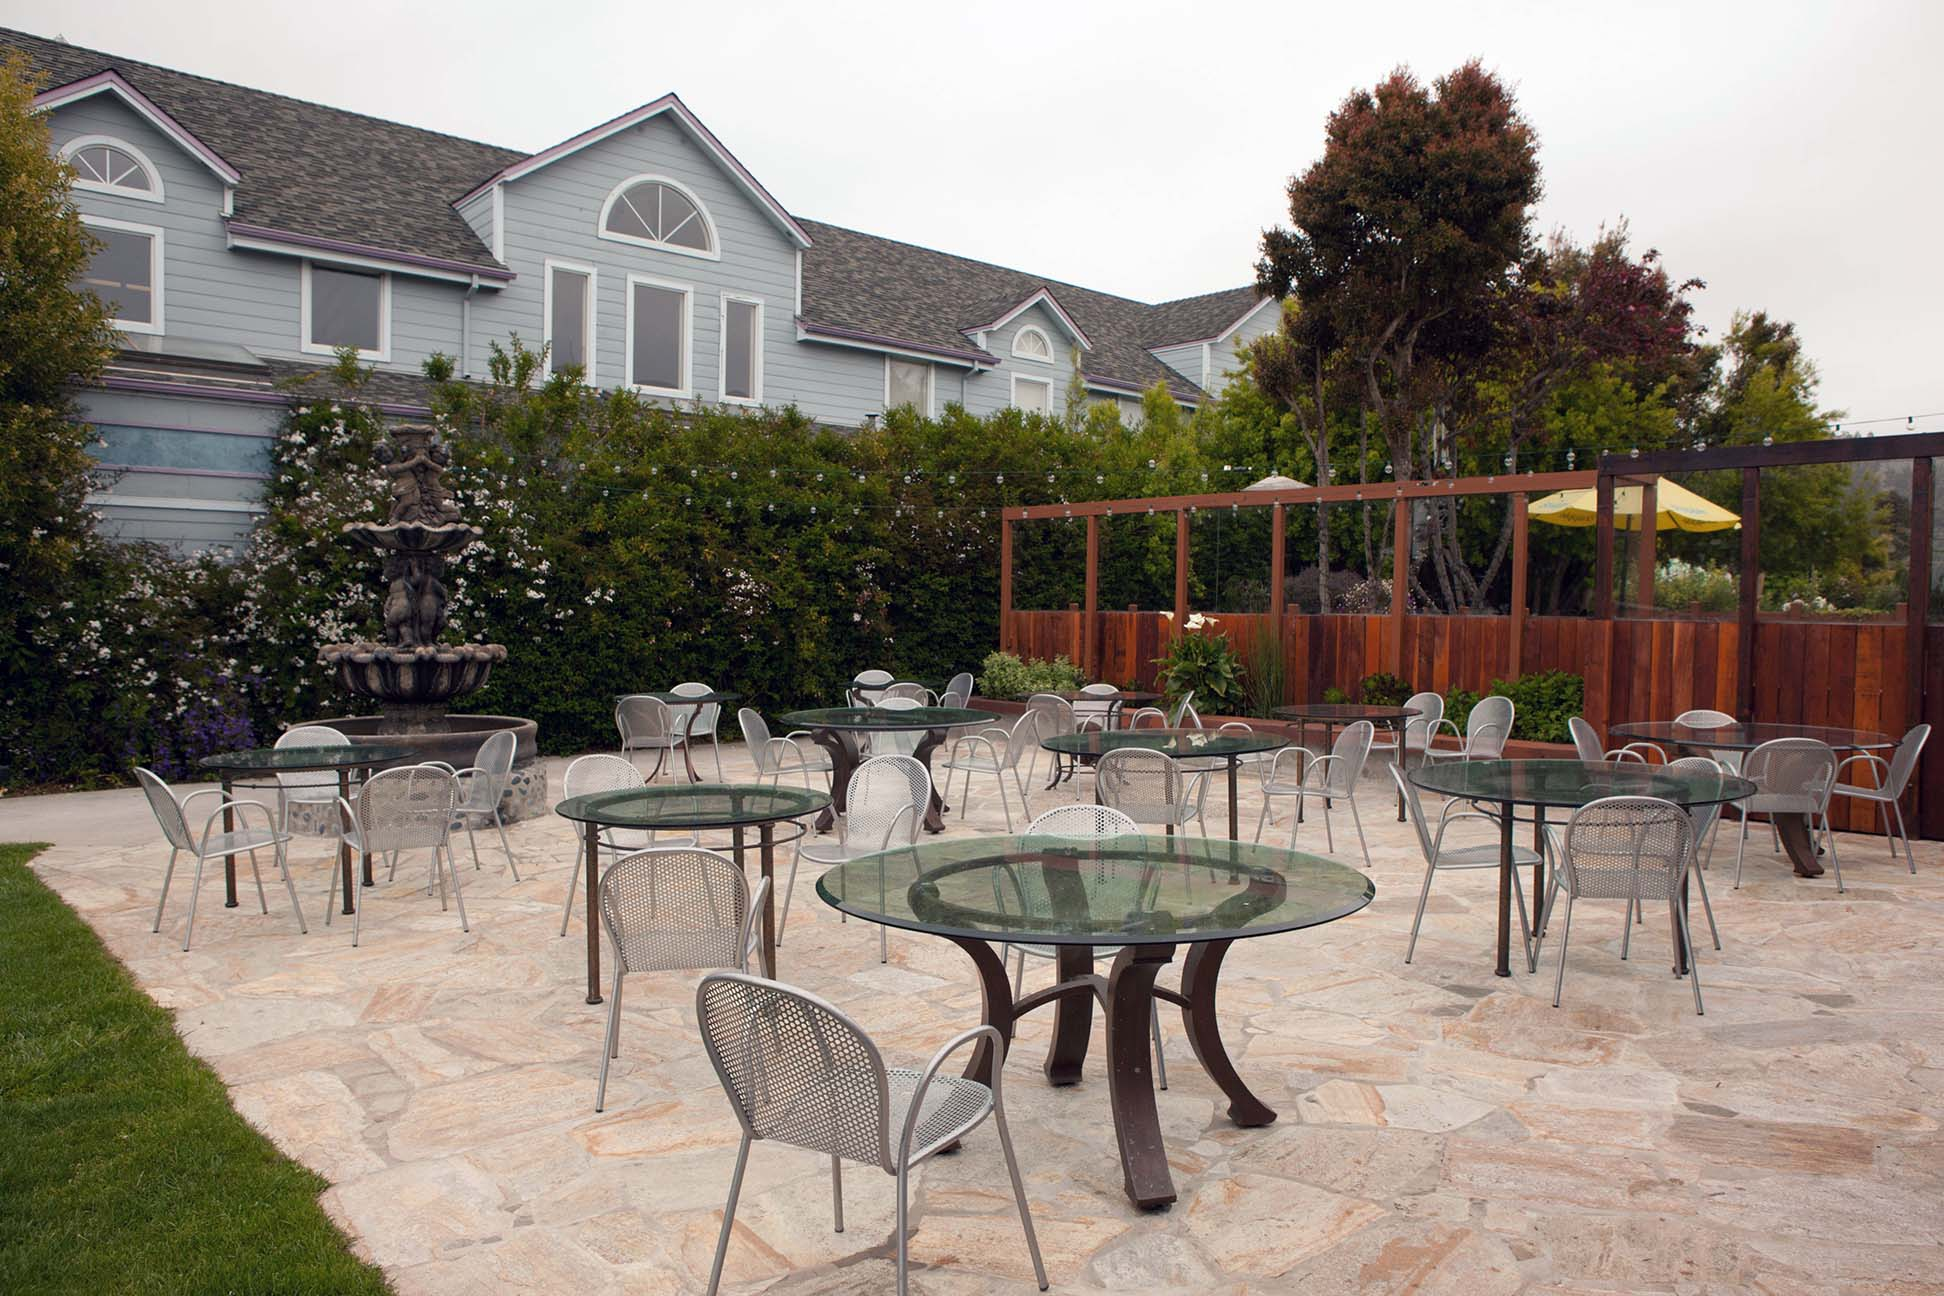 hotel patio photo